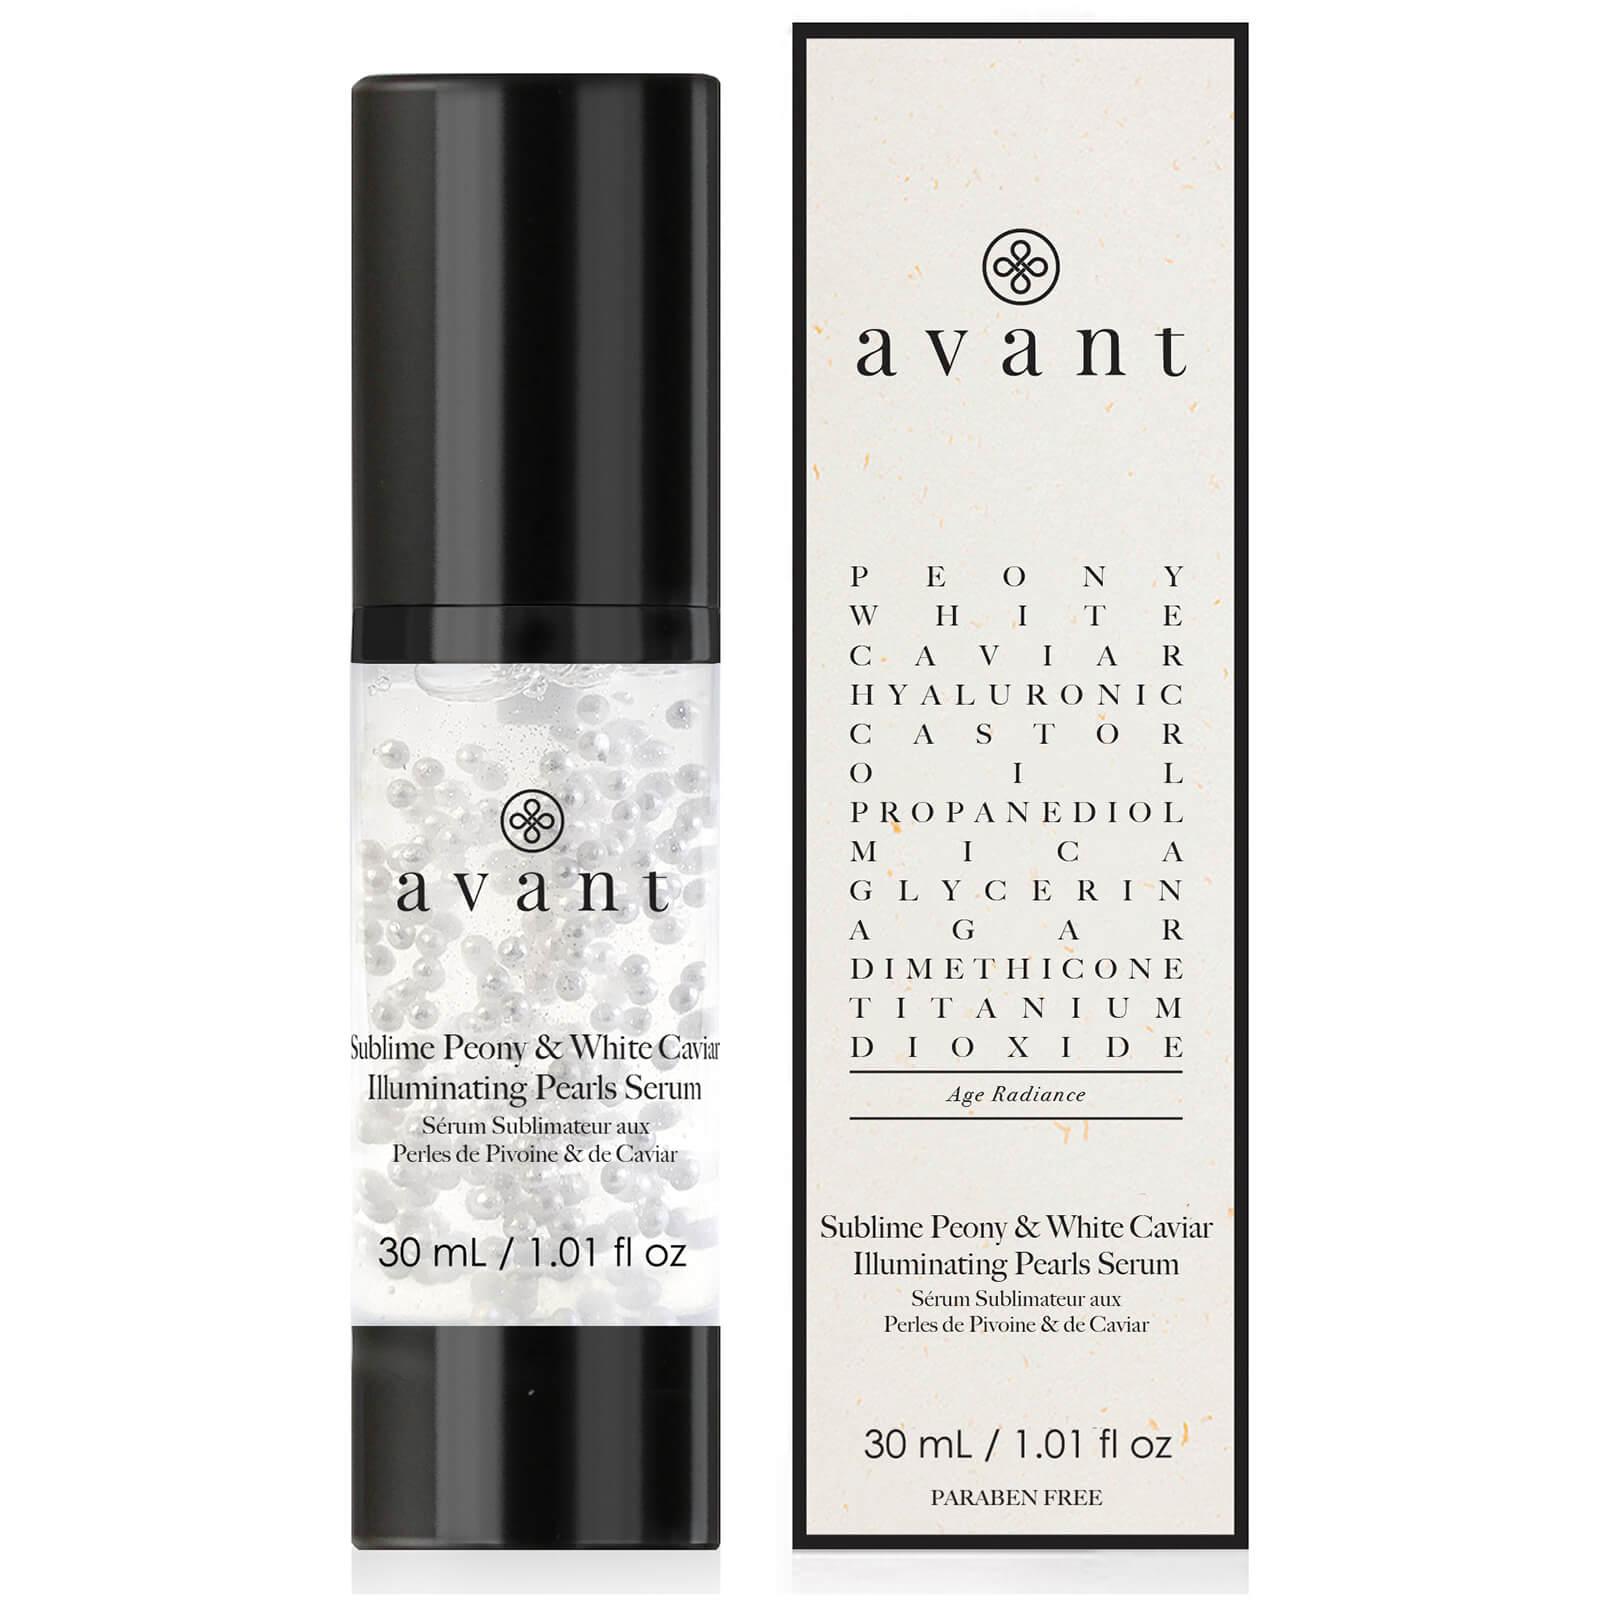 Creme viso al caviale: Avant Skincare - Sublime Peony and White Caviar Illuminating Pearls Serum